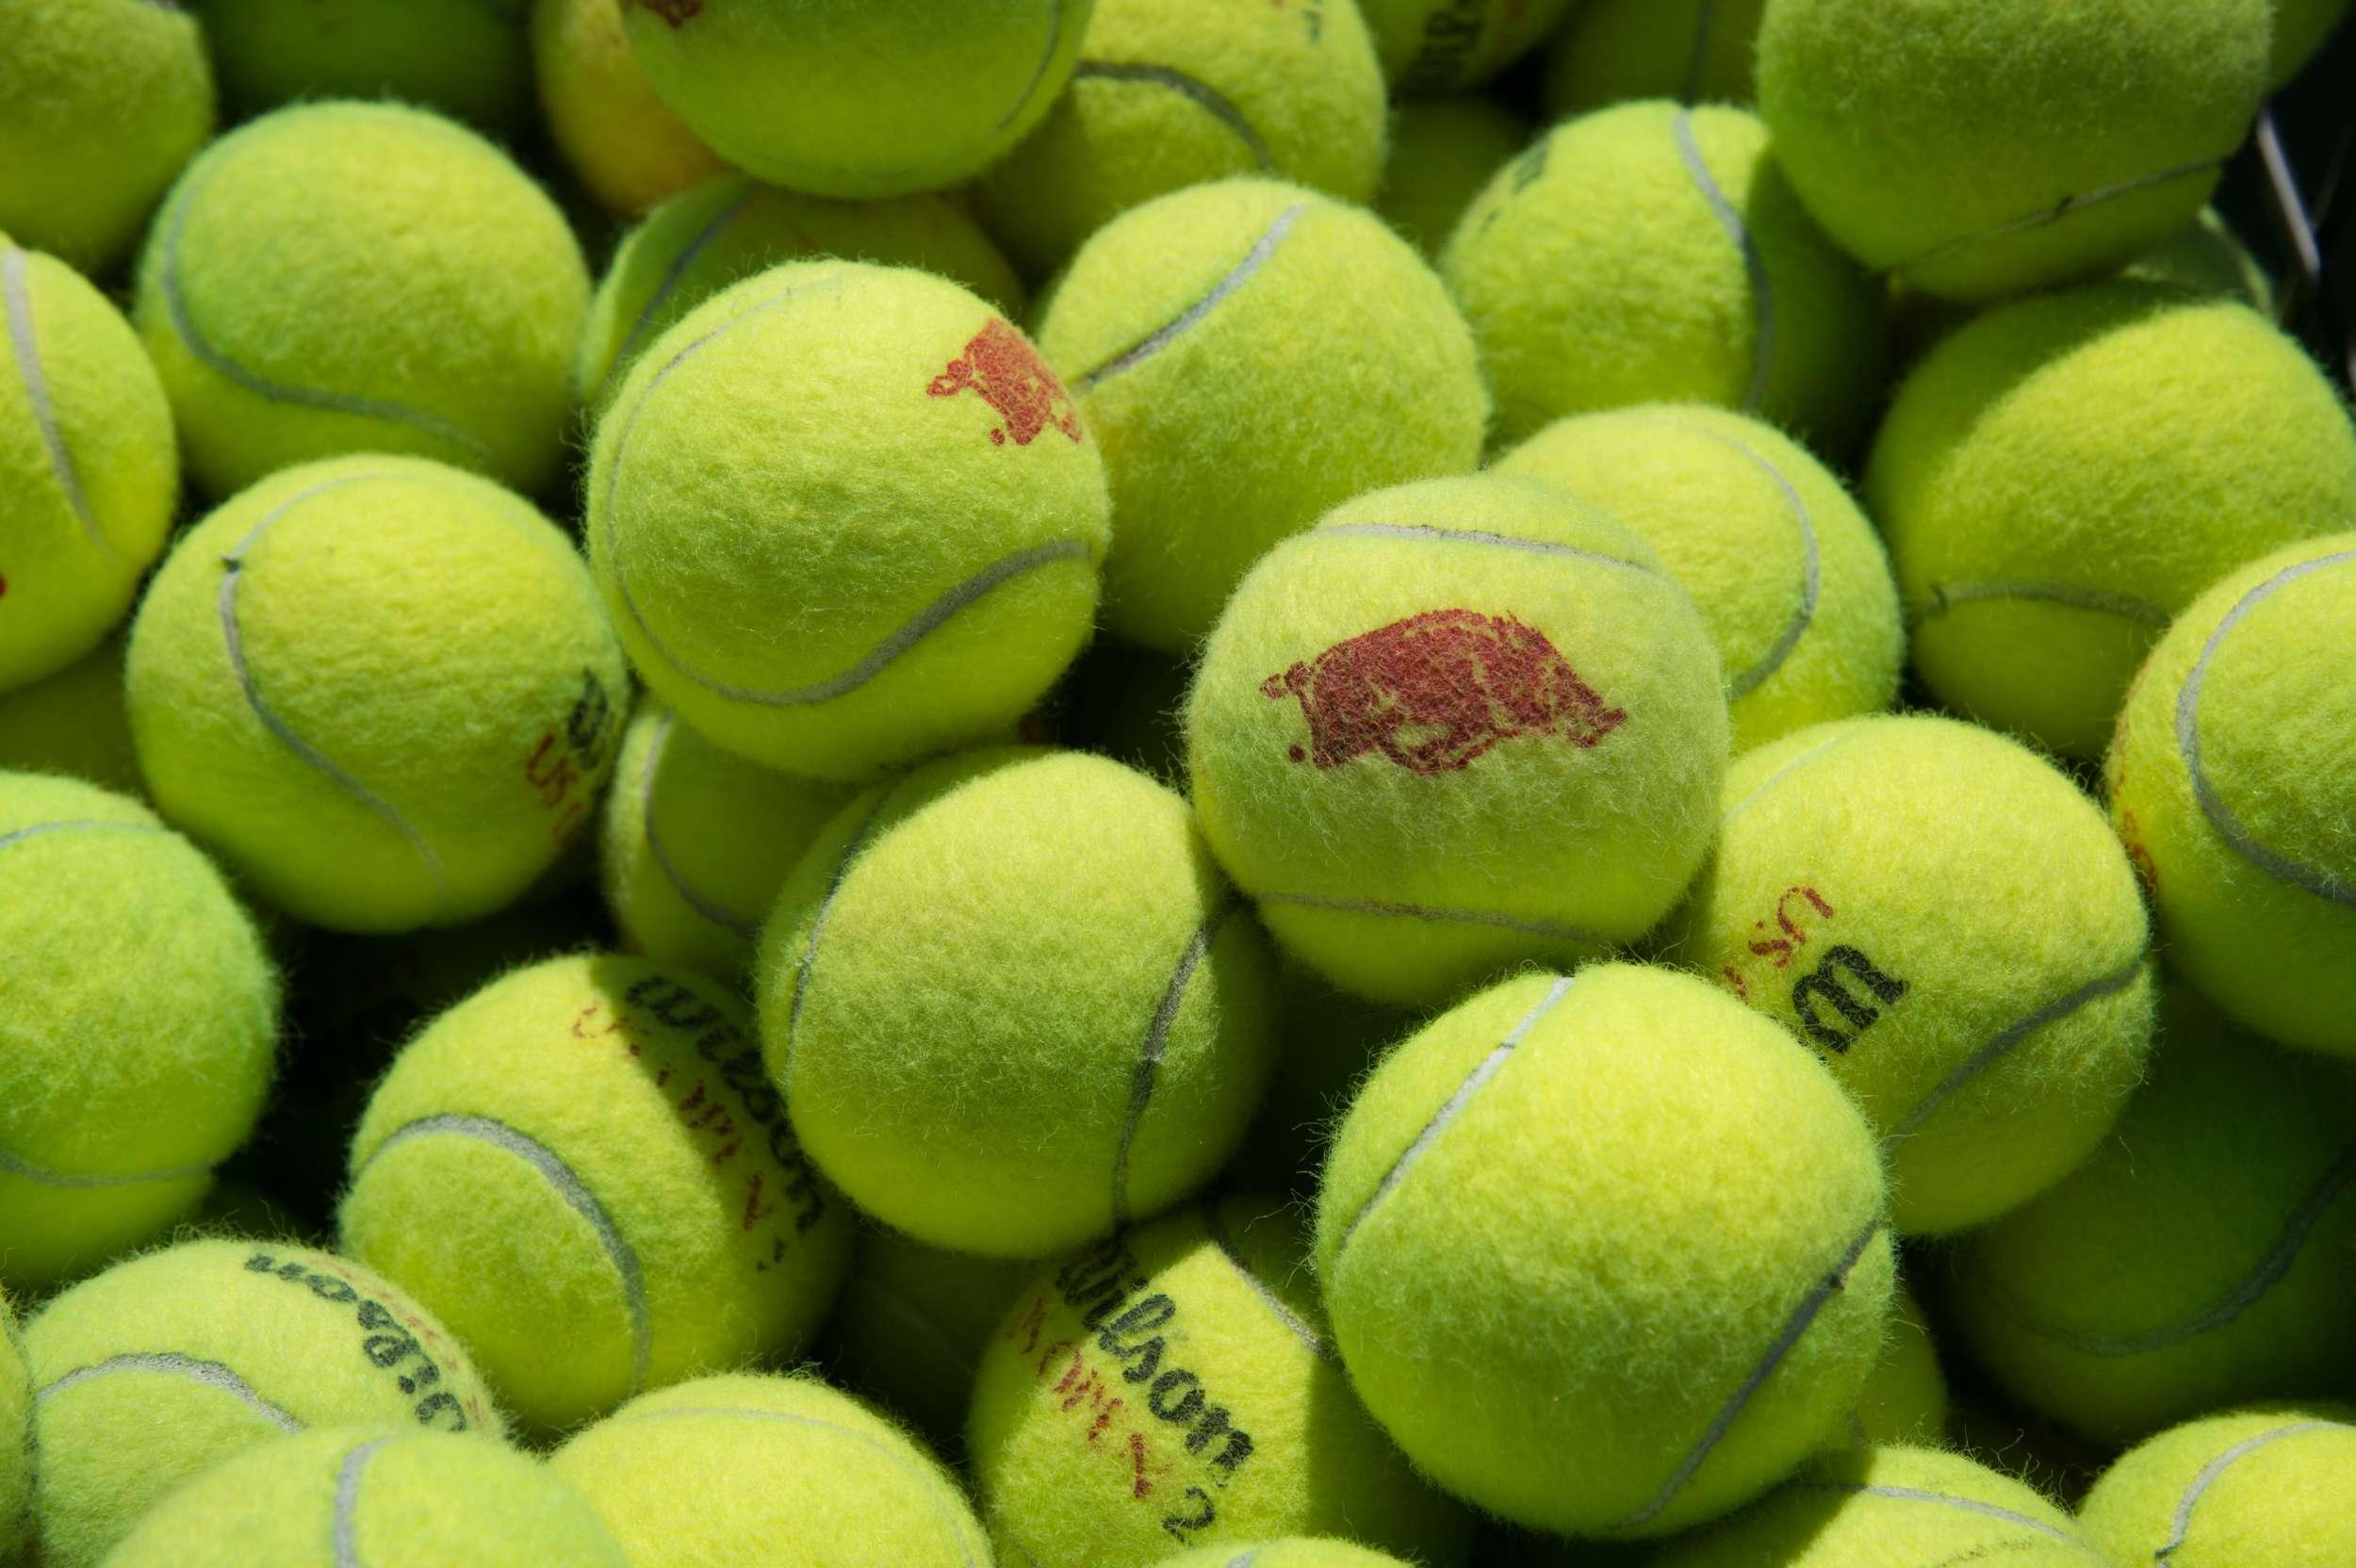 https://arkansasrazorbacks.com/wp-content/uploads/2019/04/George-Billingsley-Tennis-Center-2018-4351.jpg